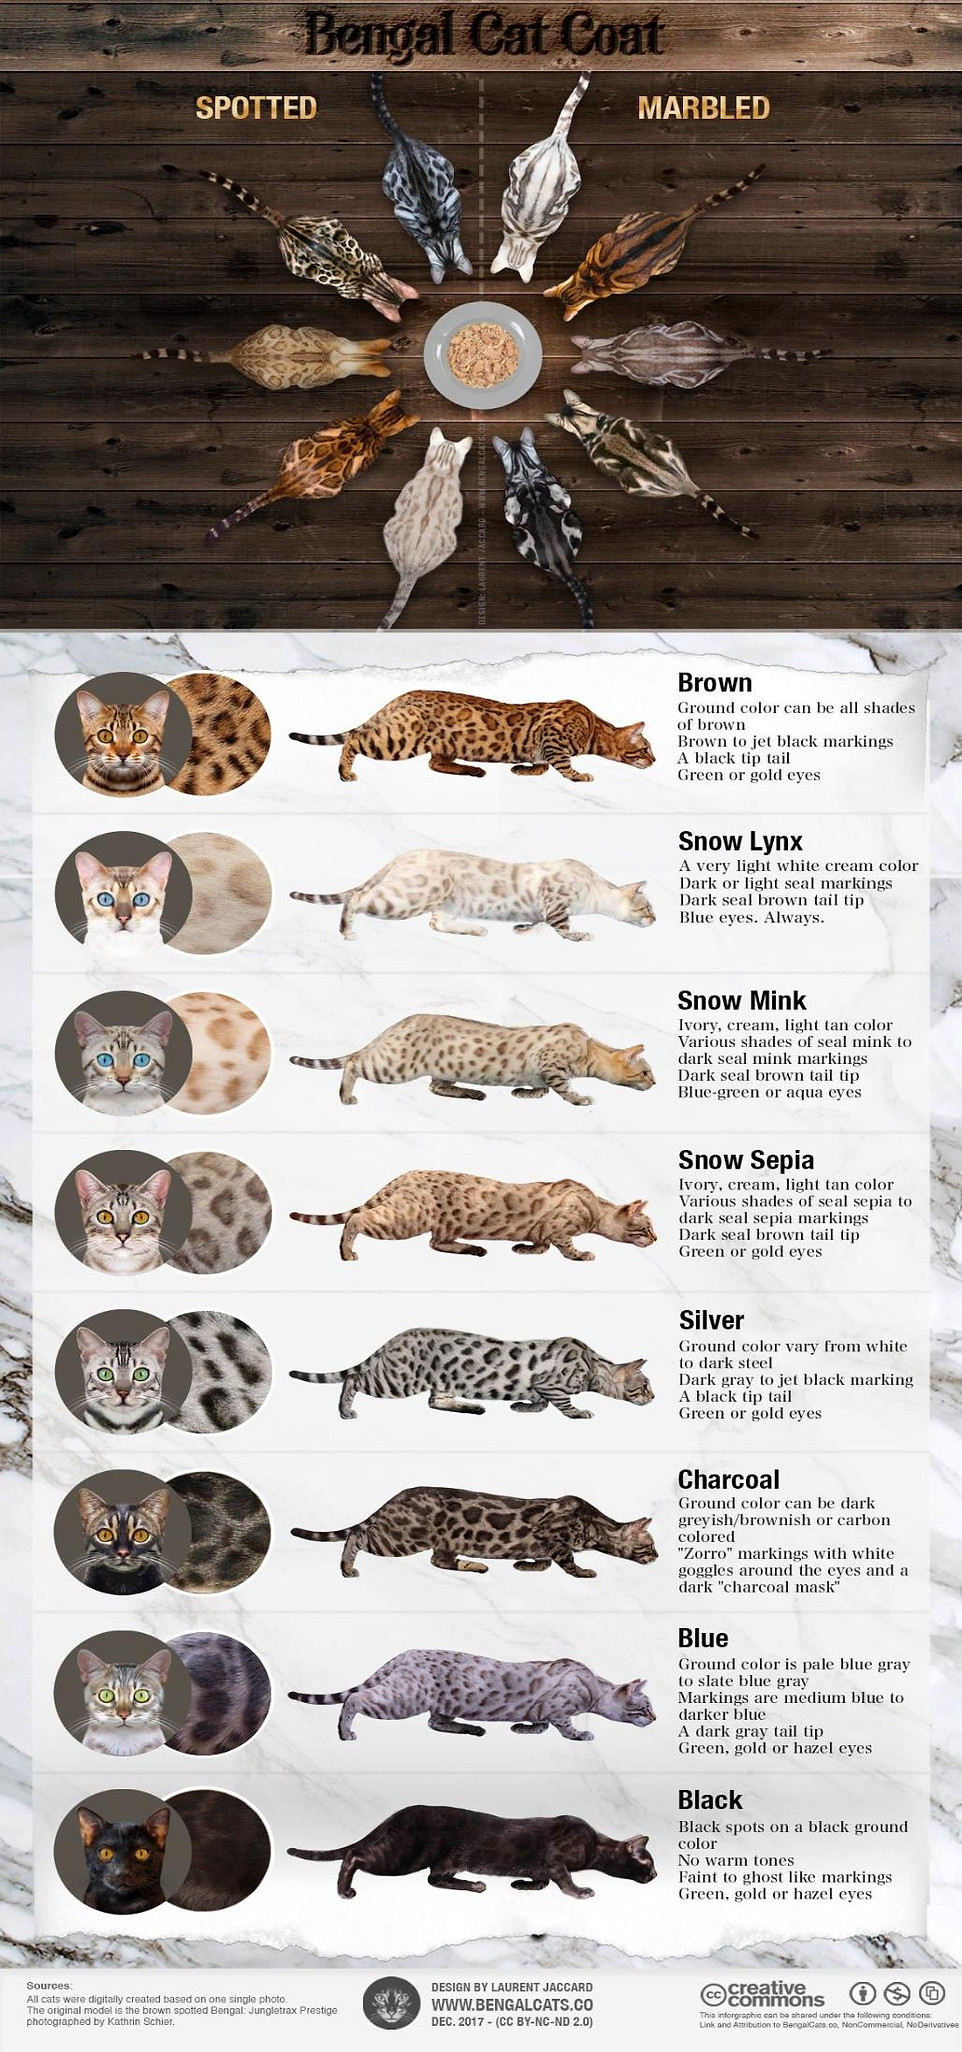 bengal-cat-colors-patterns-coat-infograp